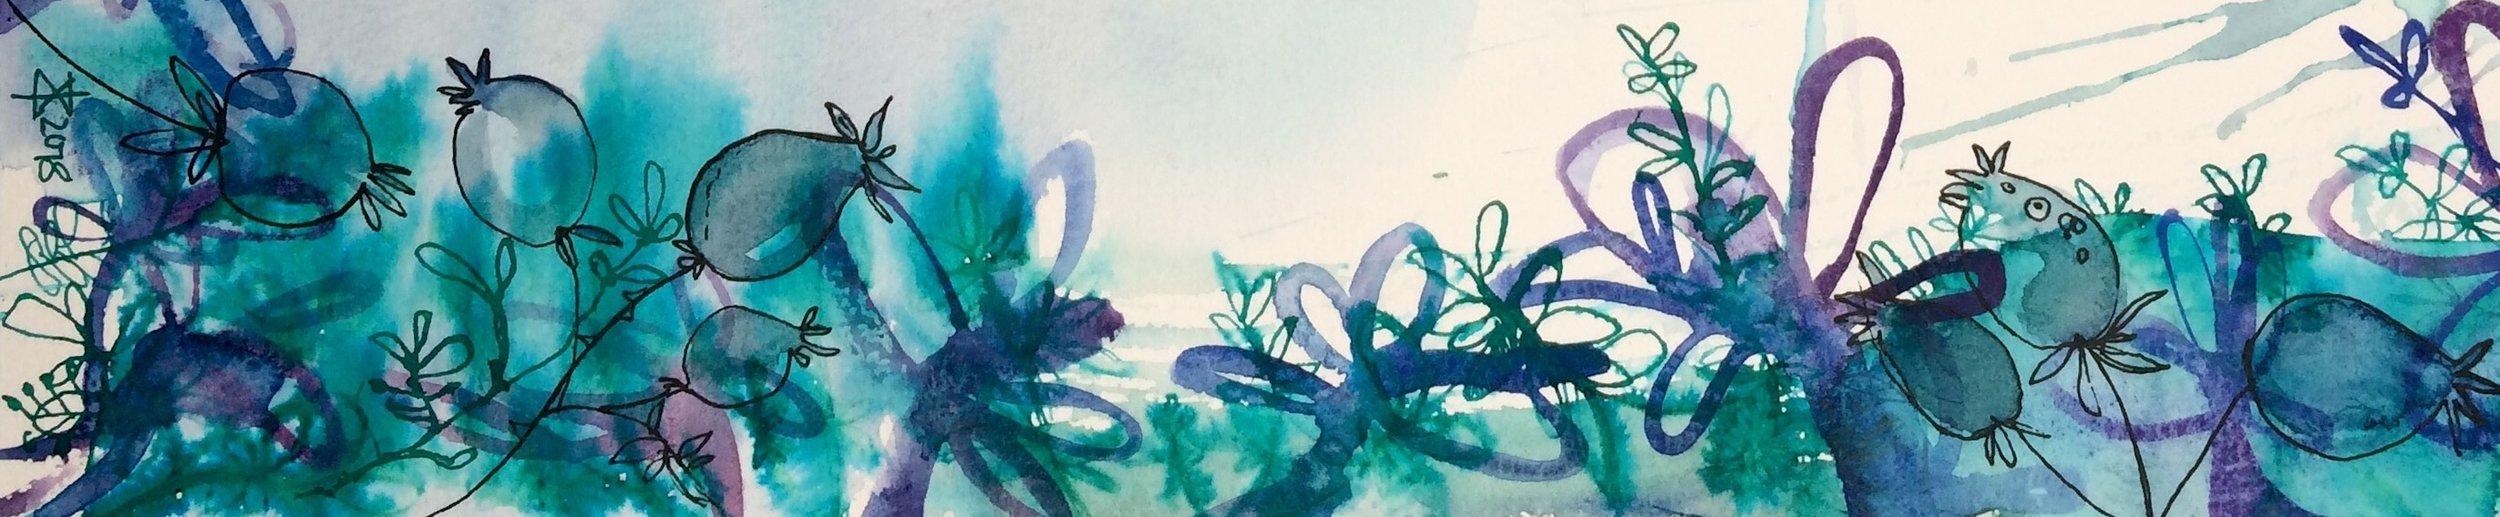 botanical fantasy in turquoise